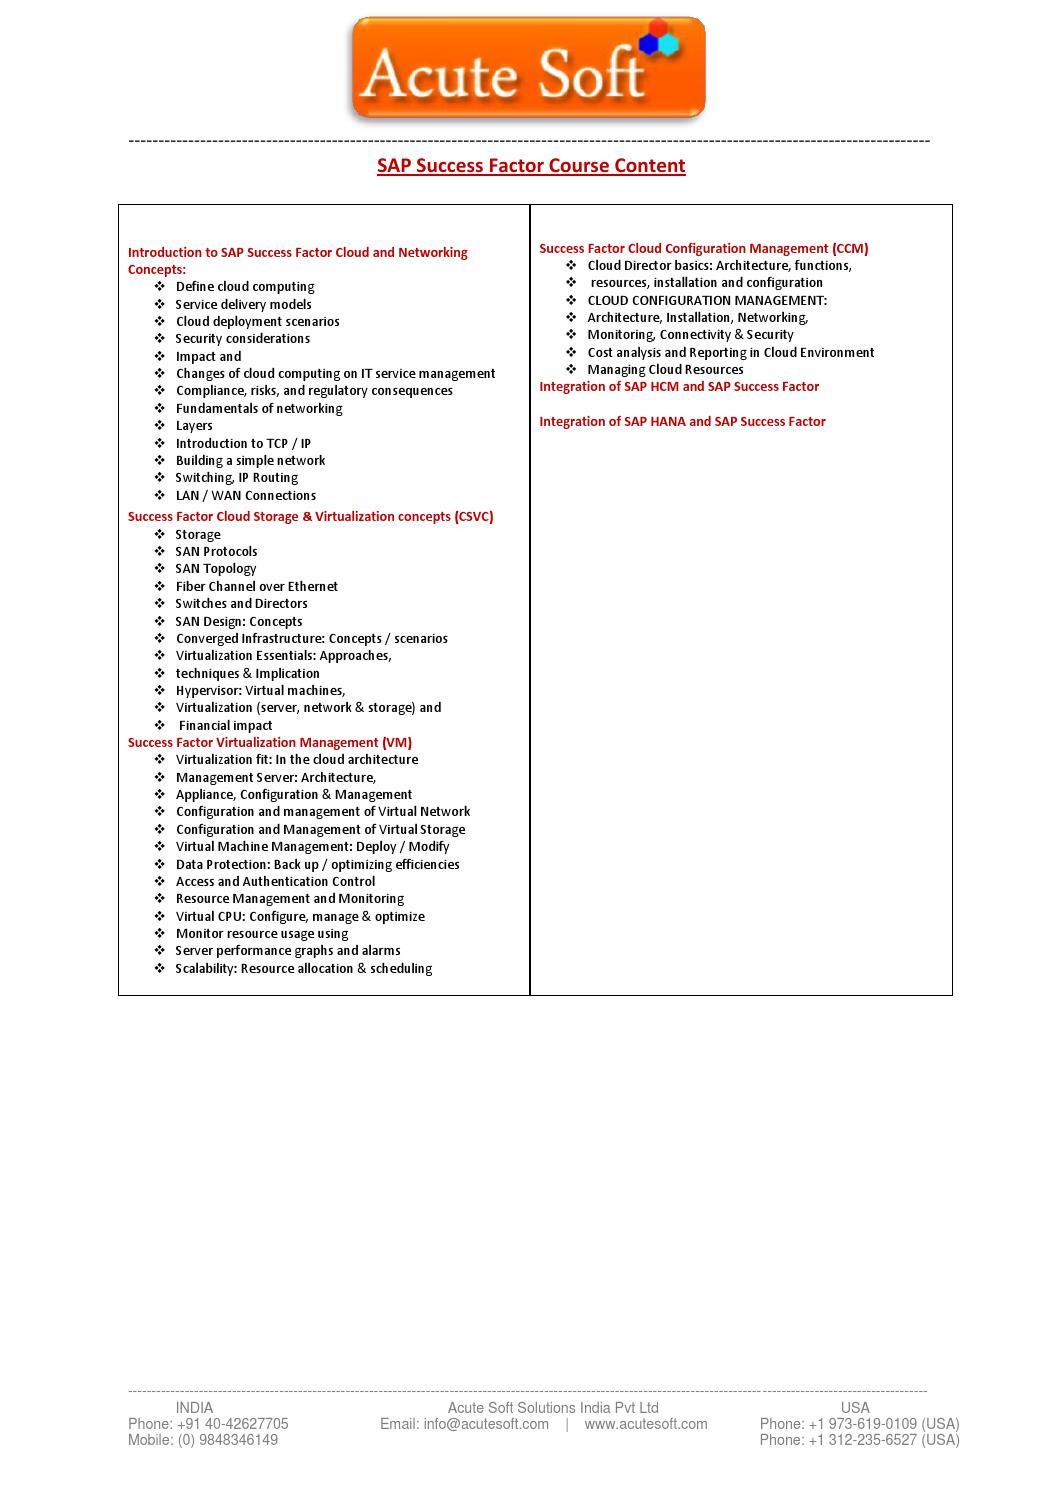 SAP SuccessFactors Training - SAP ALL Online Training by